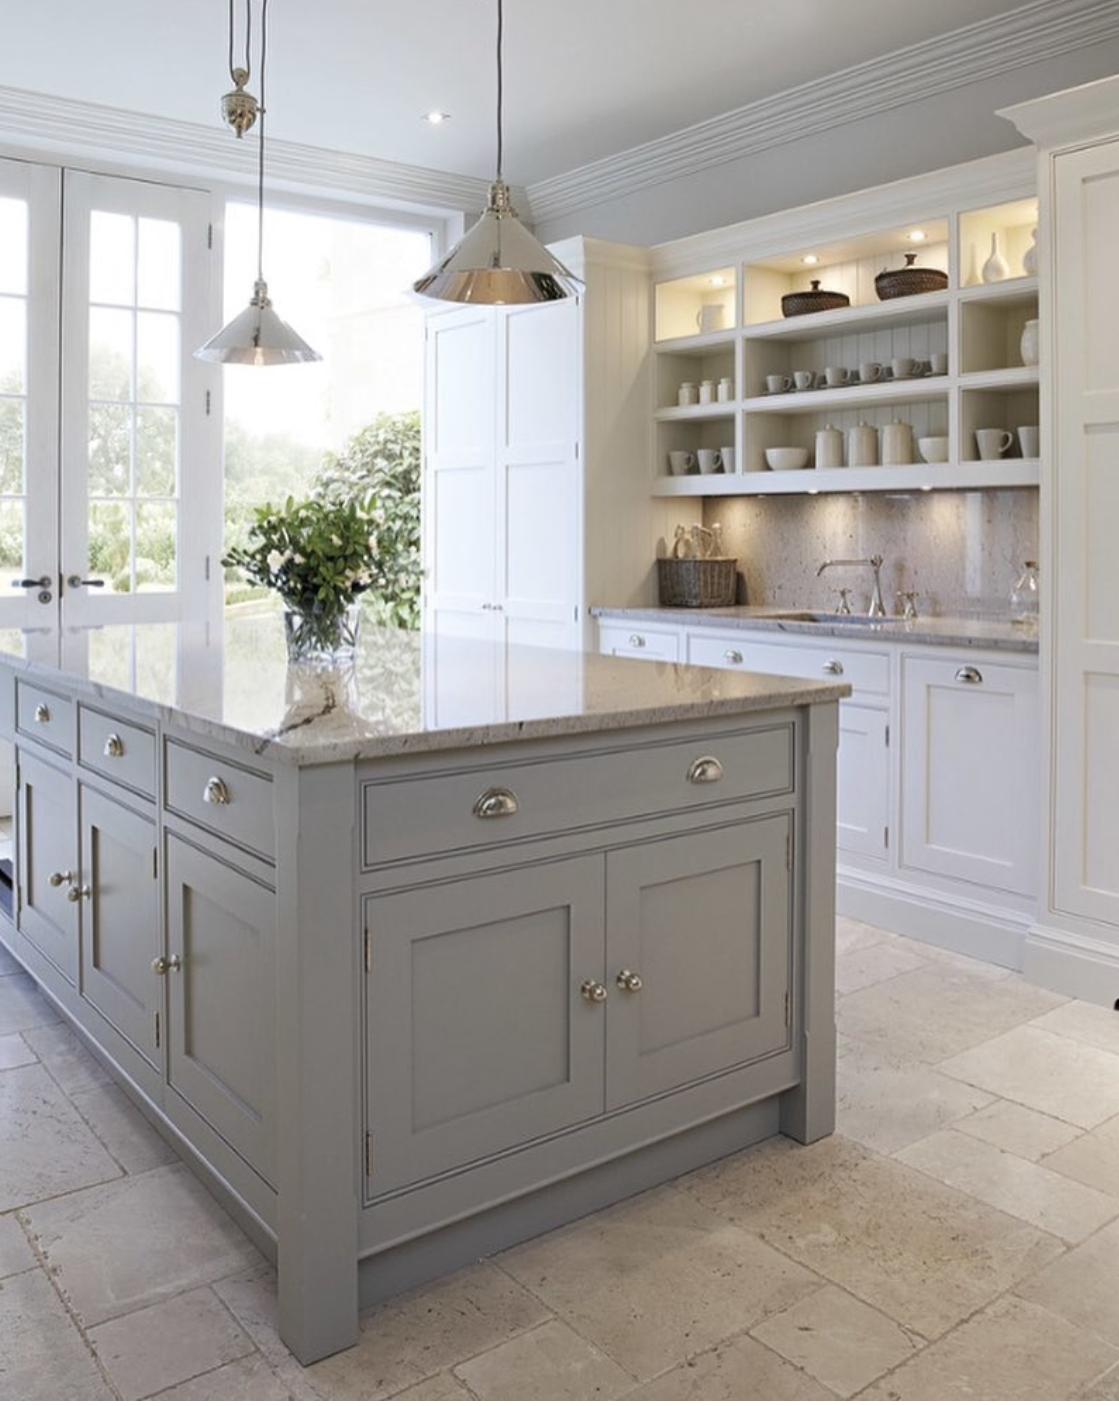 Grey French Provisional Kitchen Grey Kitchen Island Kitchen Inspirations Contemporary Kitchen